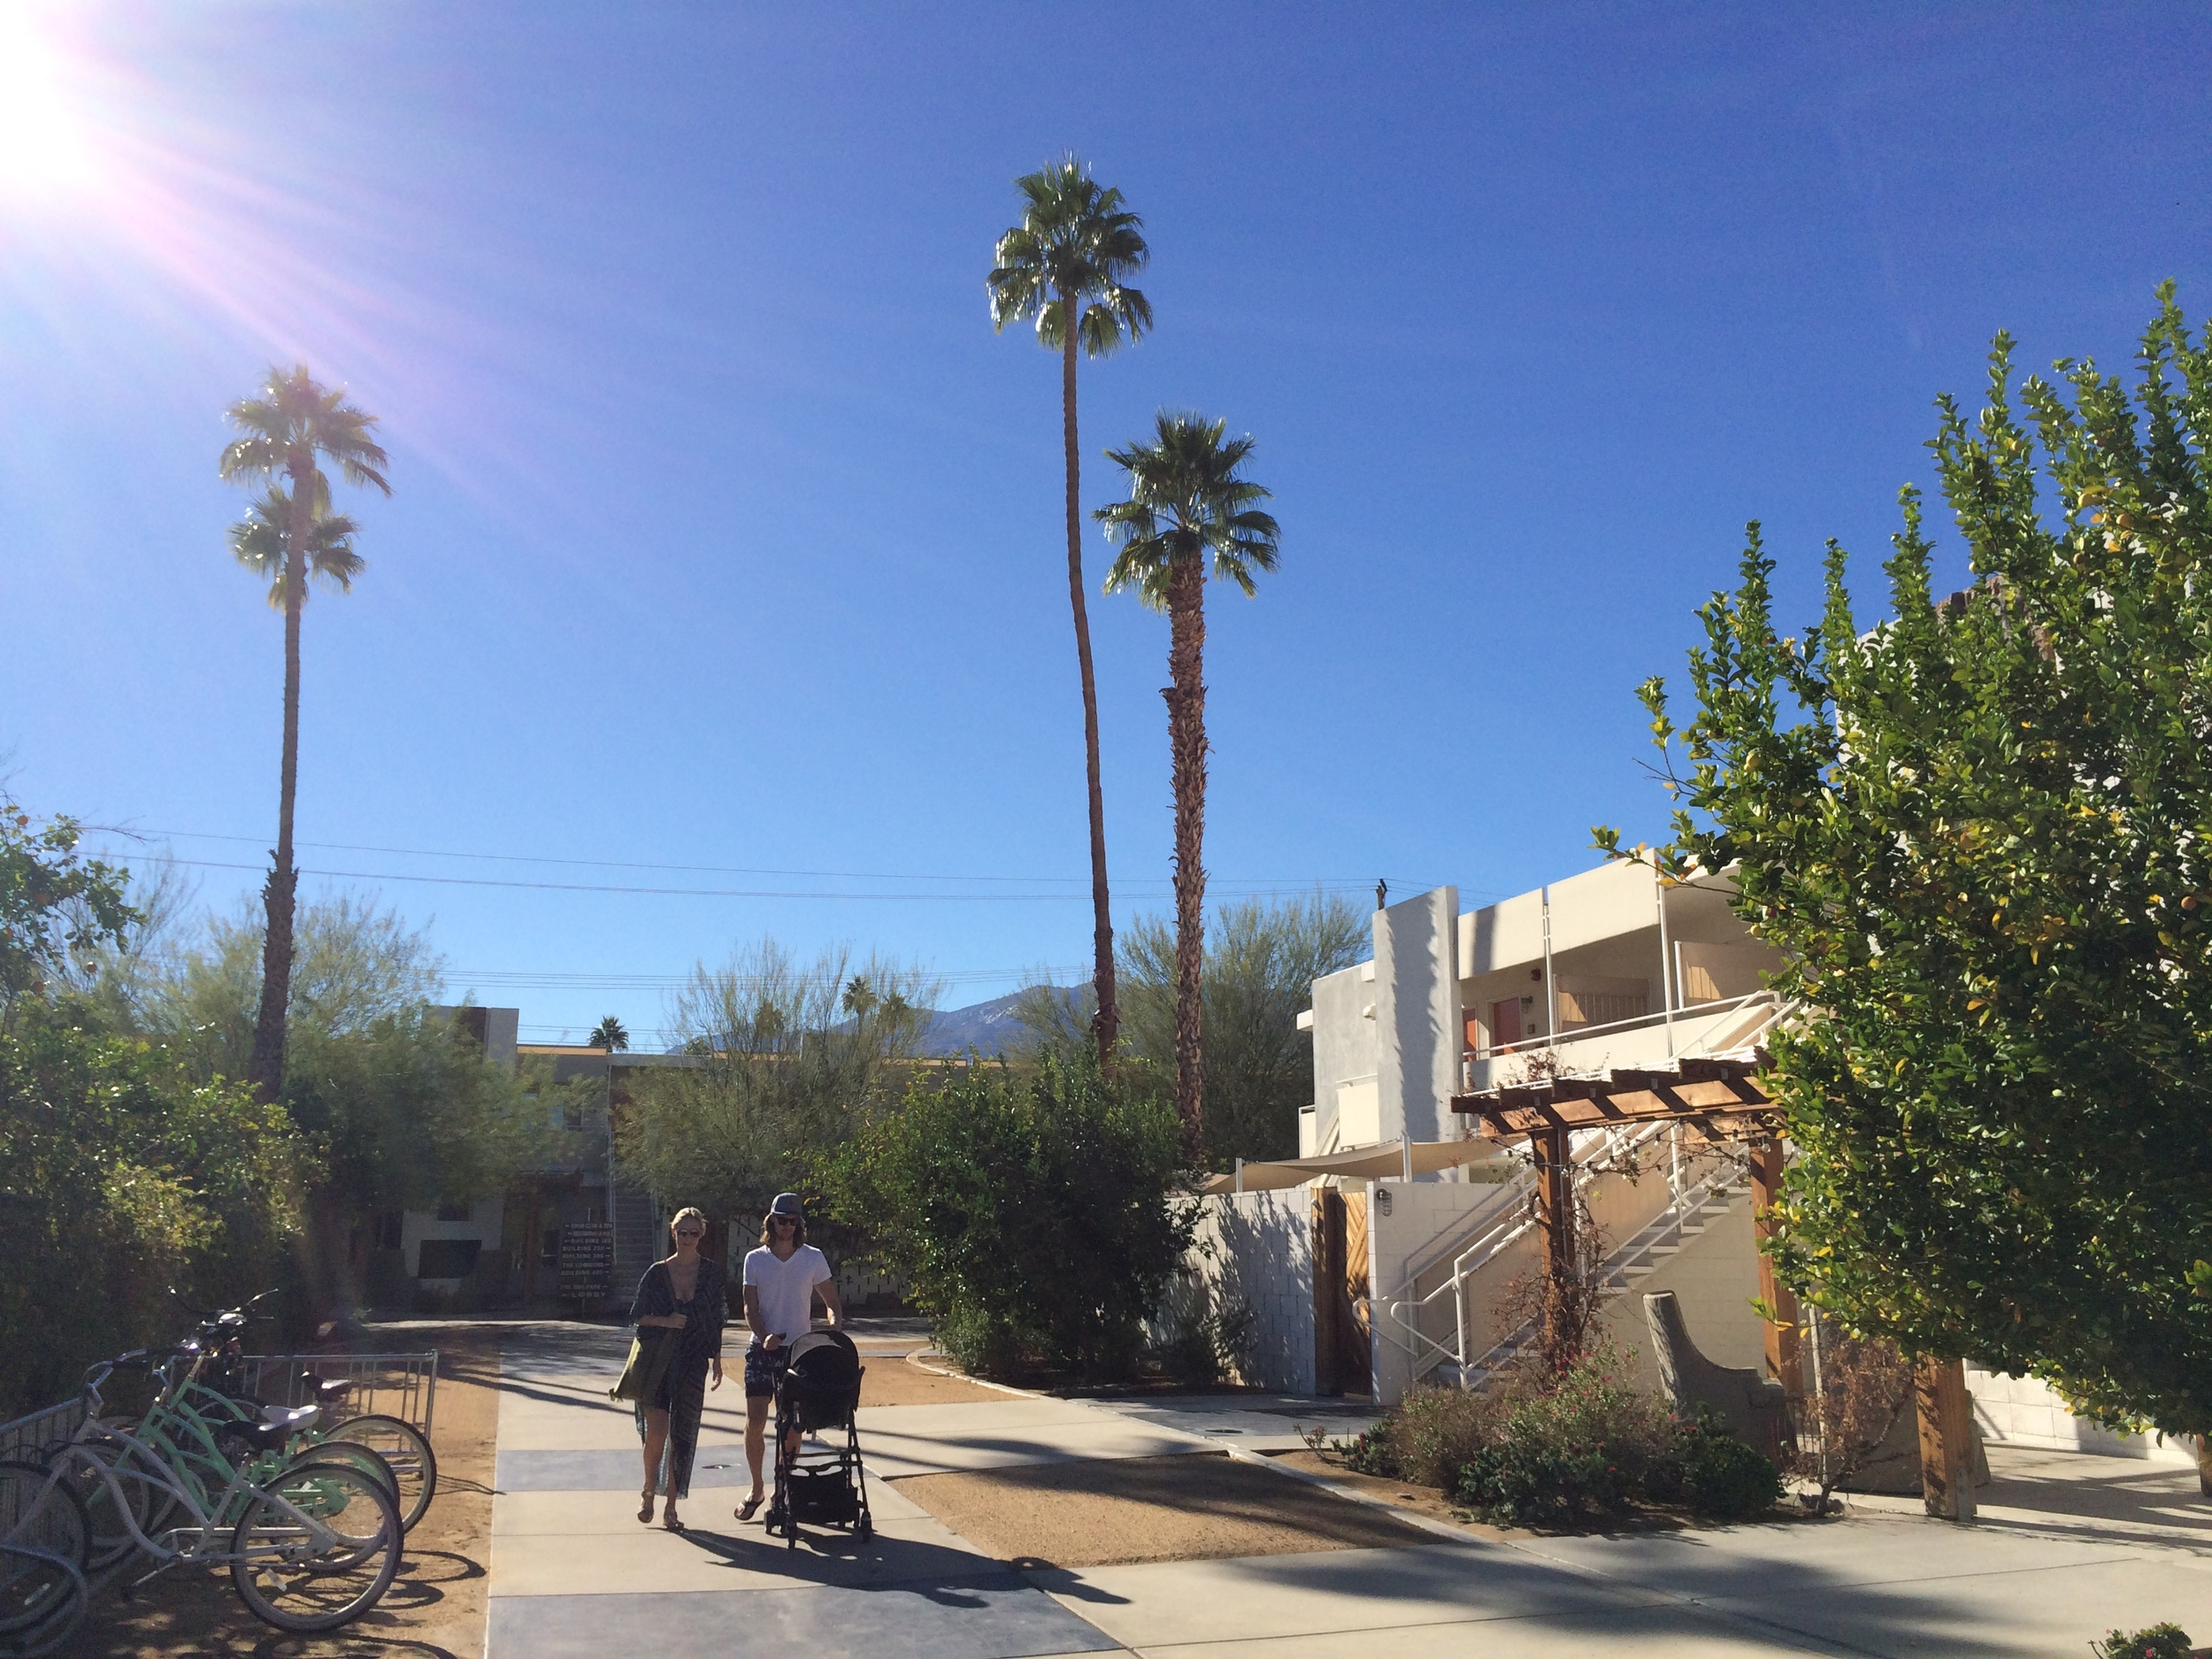 Bye bye Palm Springs. Until next time.